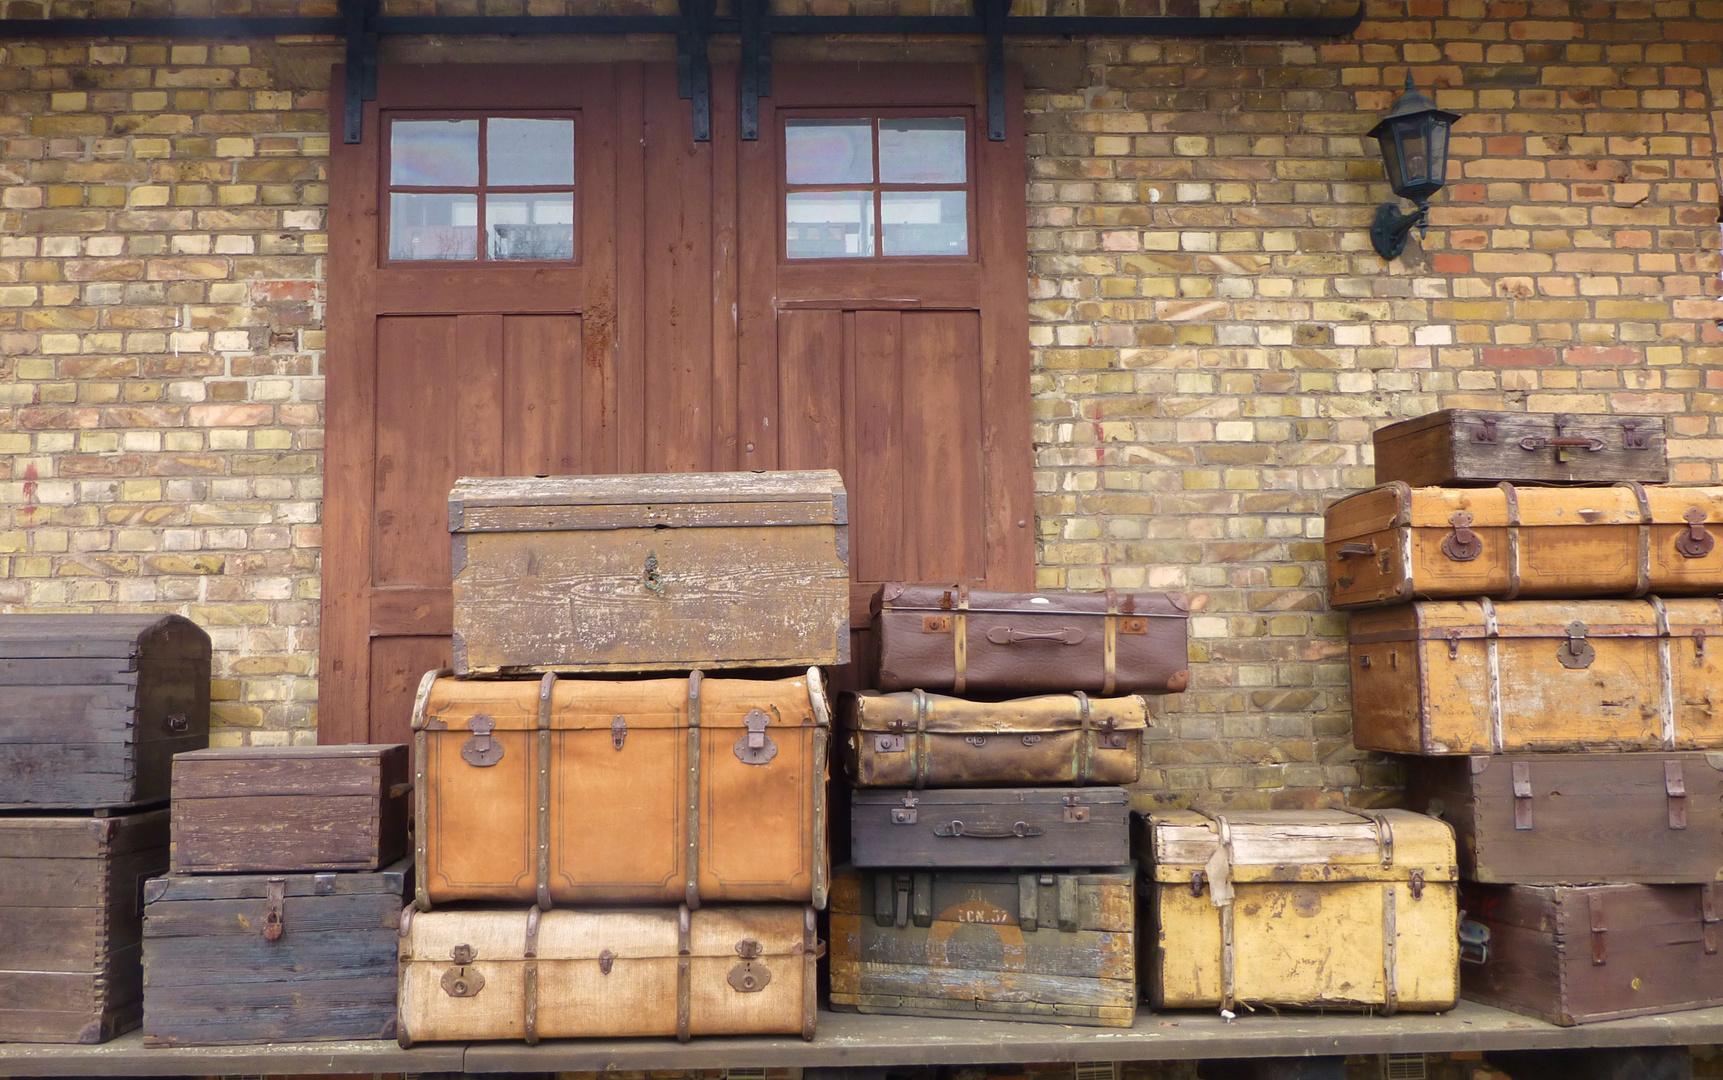 Kofferdepot